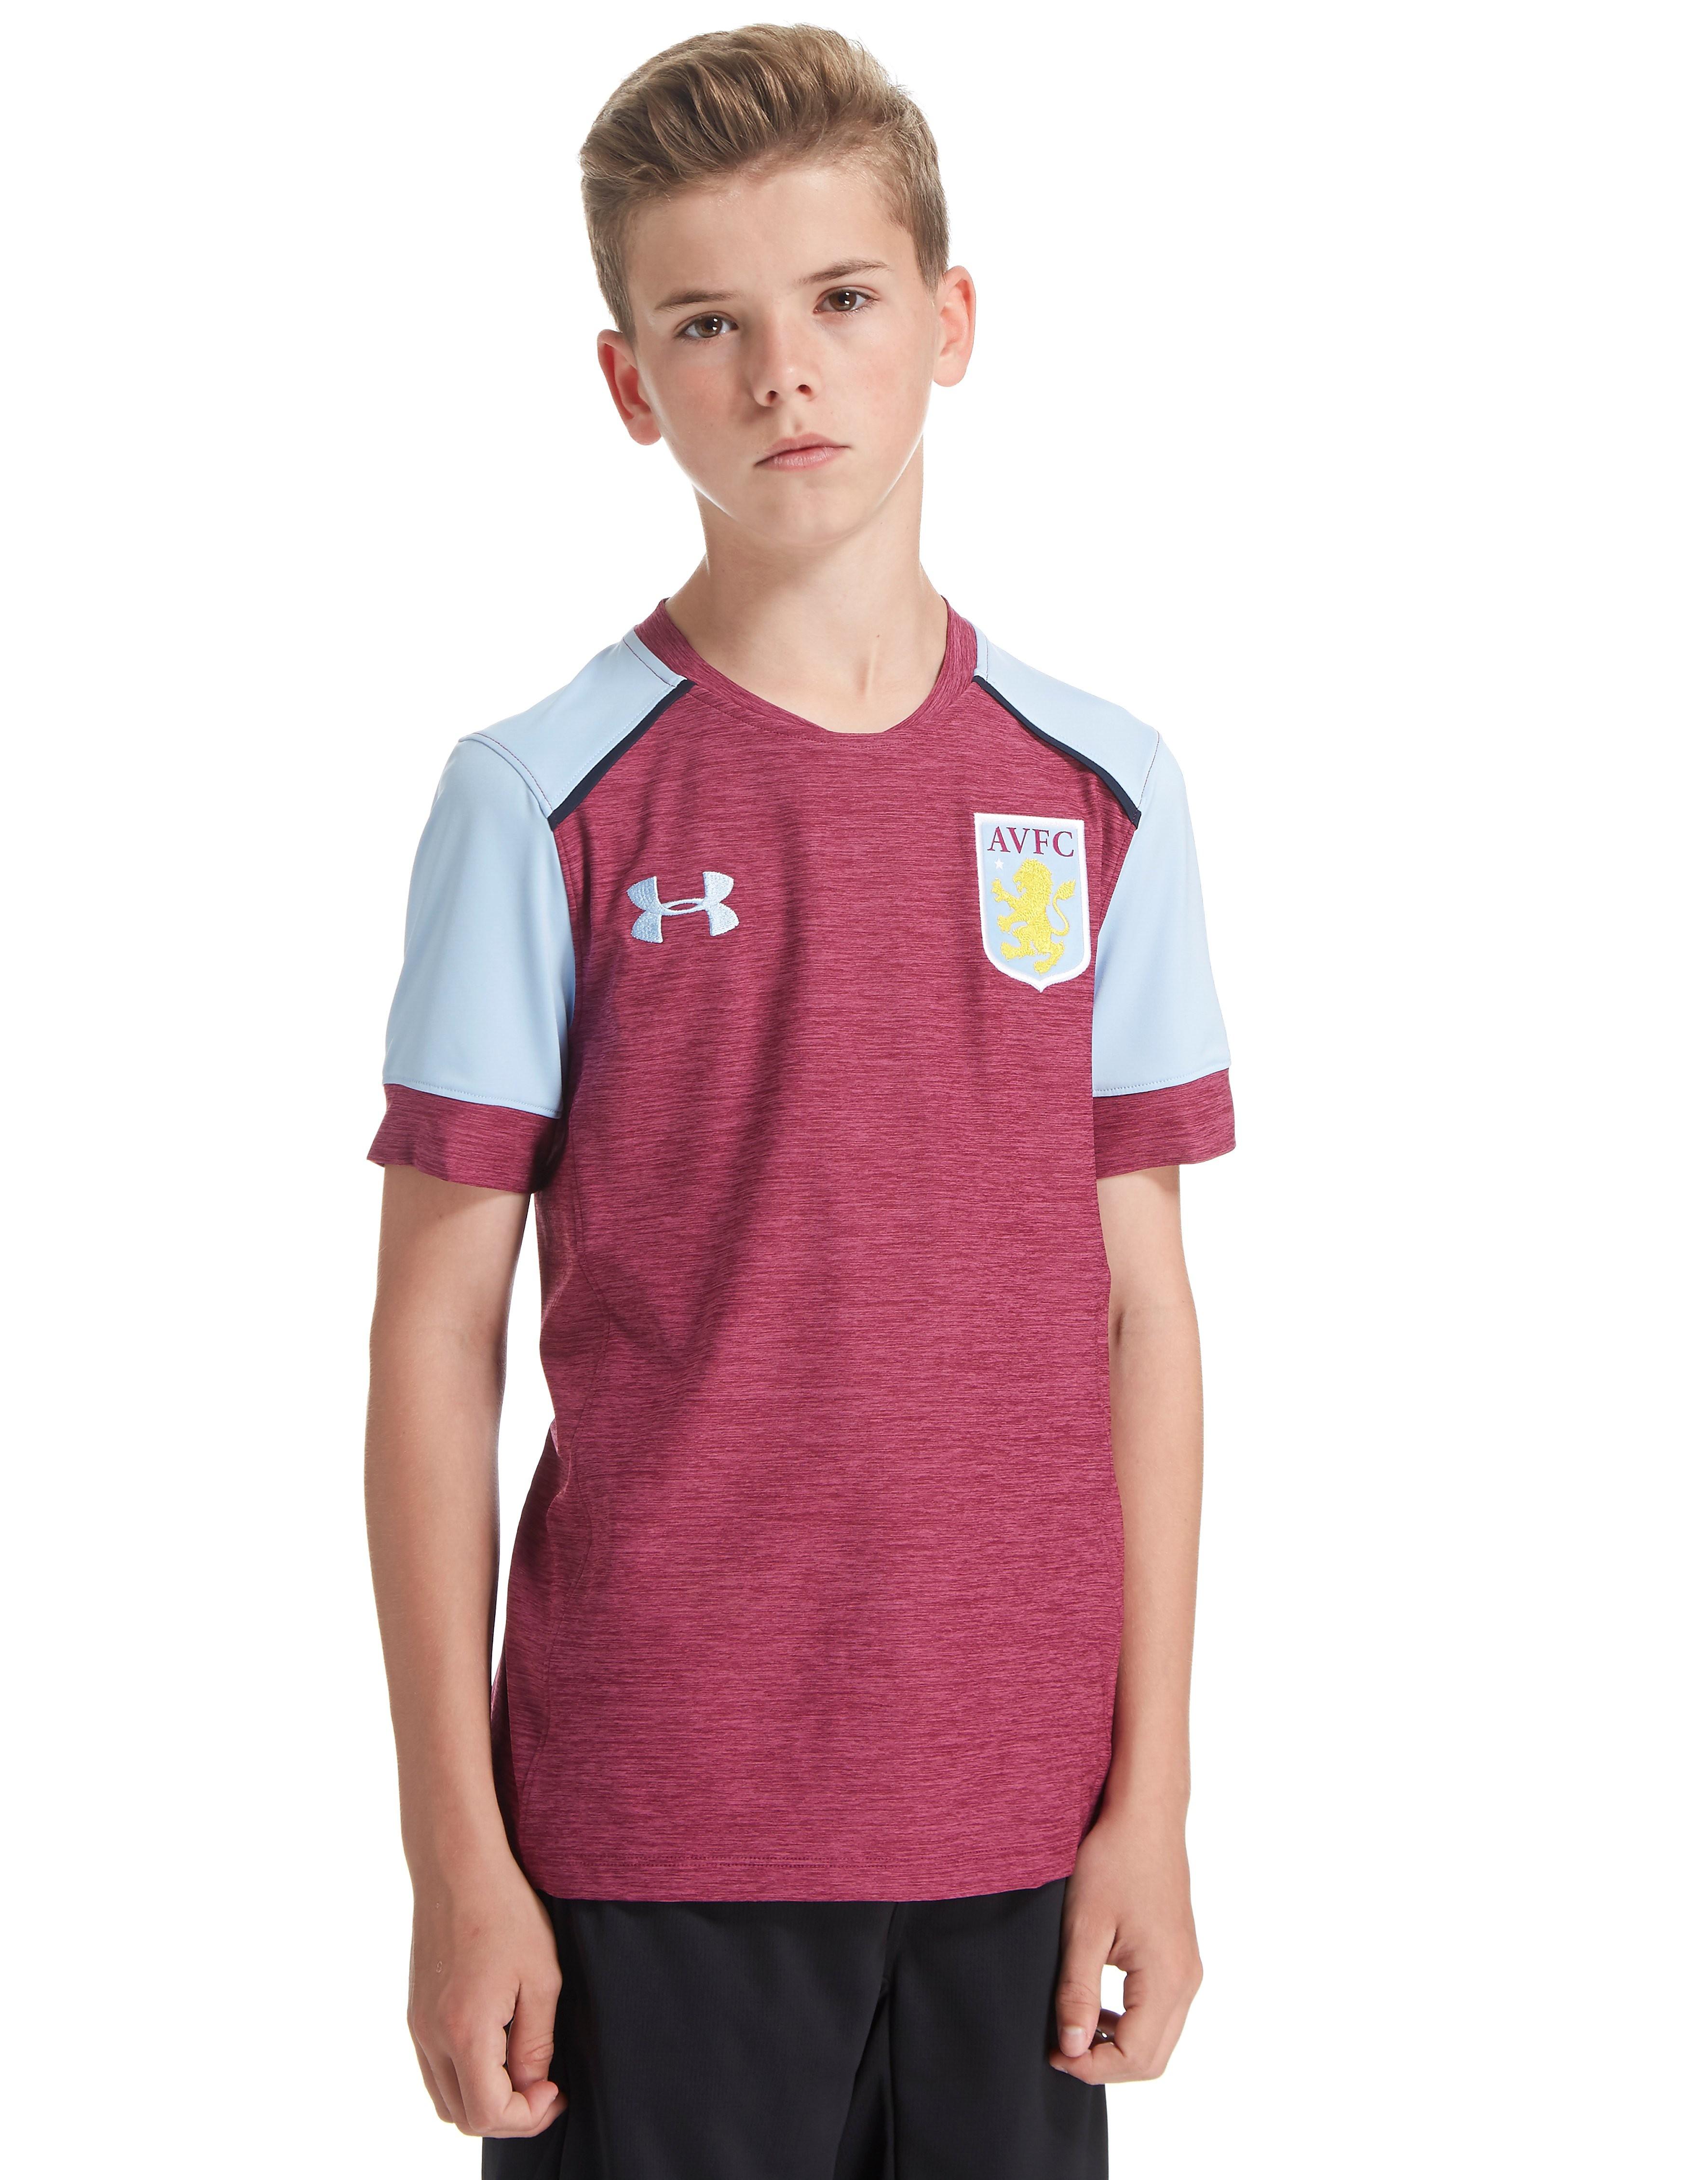 Under Armour Aston Villa FC 2016/17 Training Shirt Junior